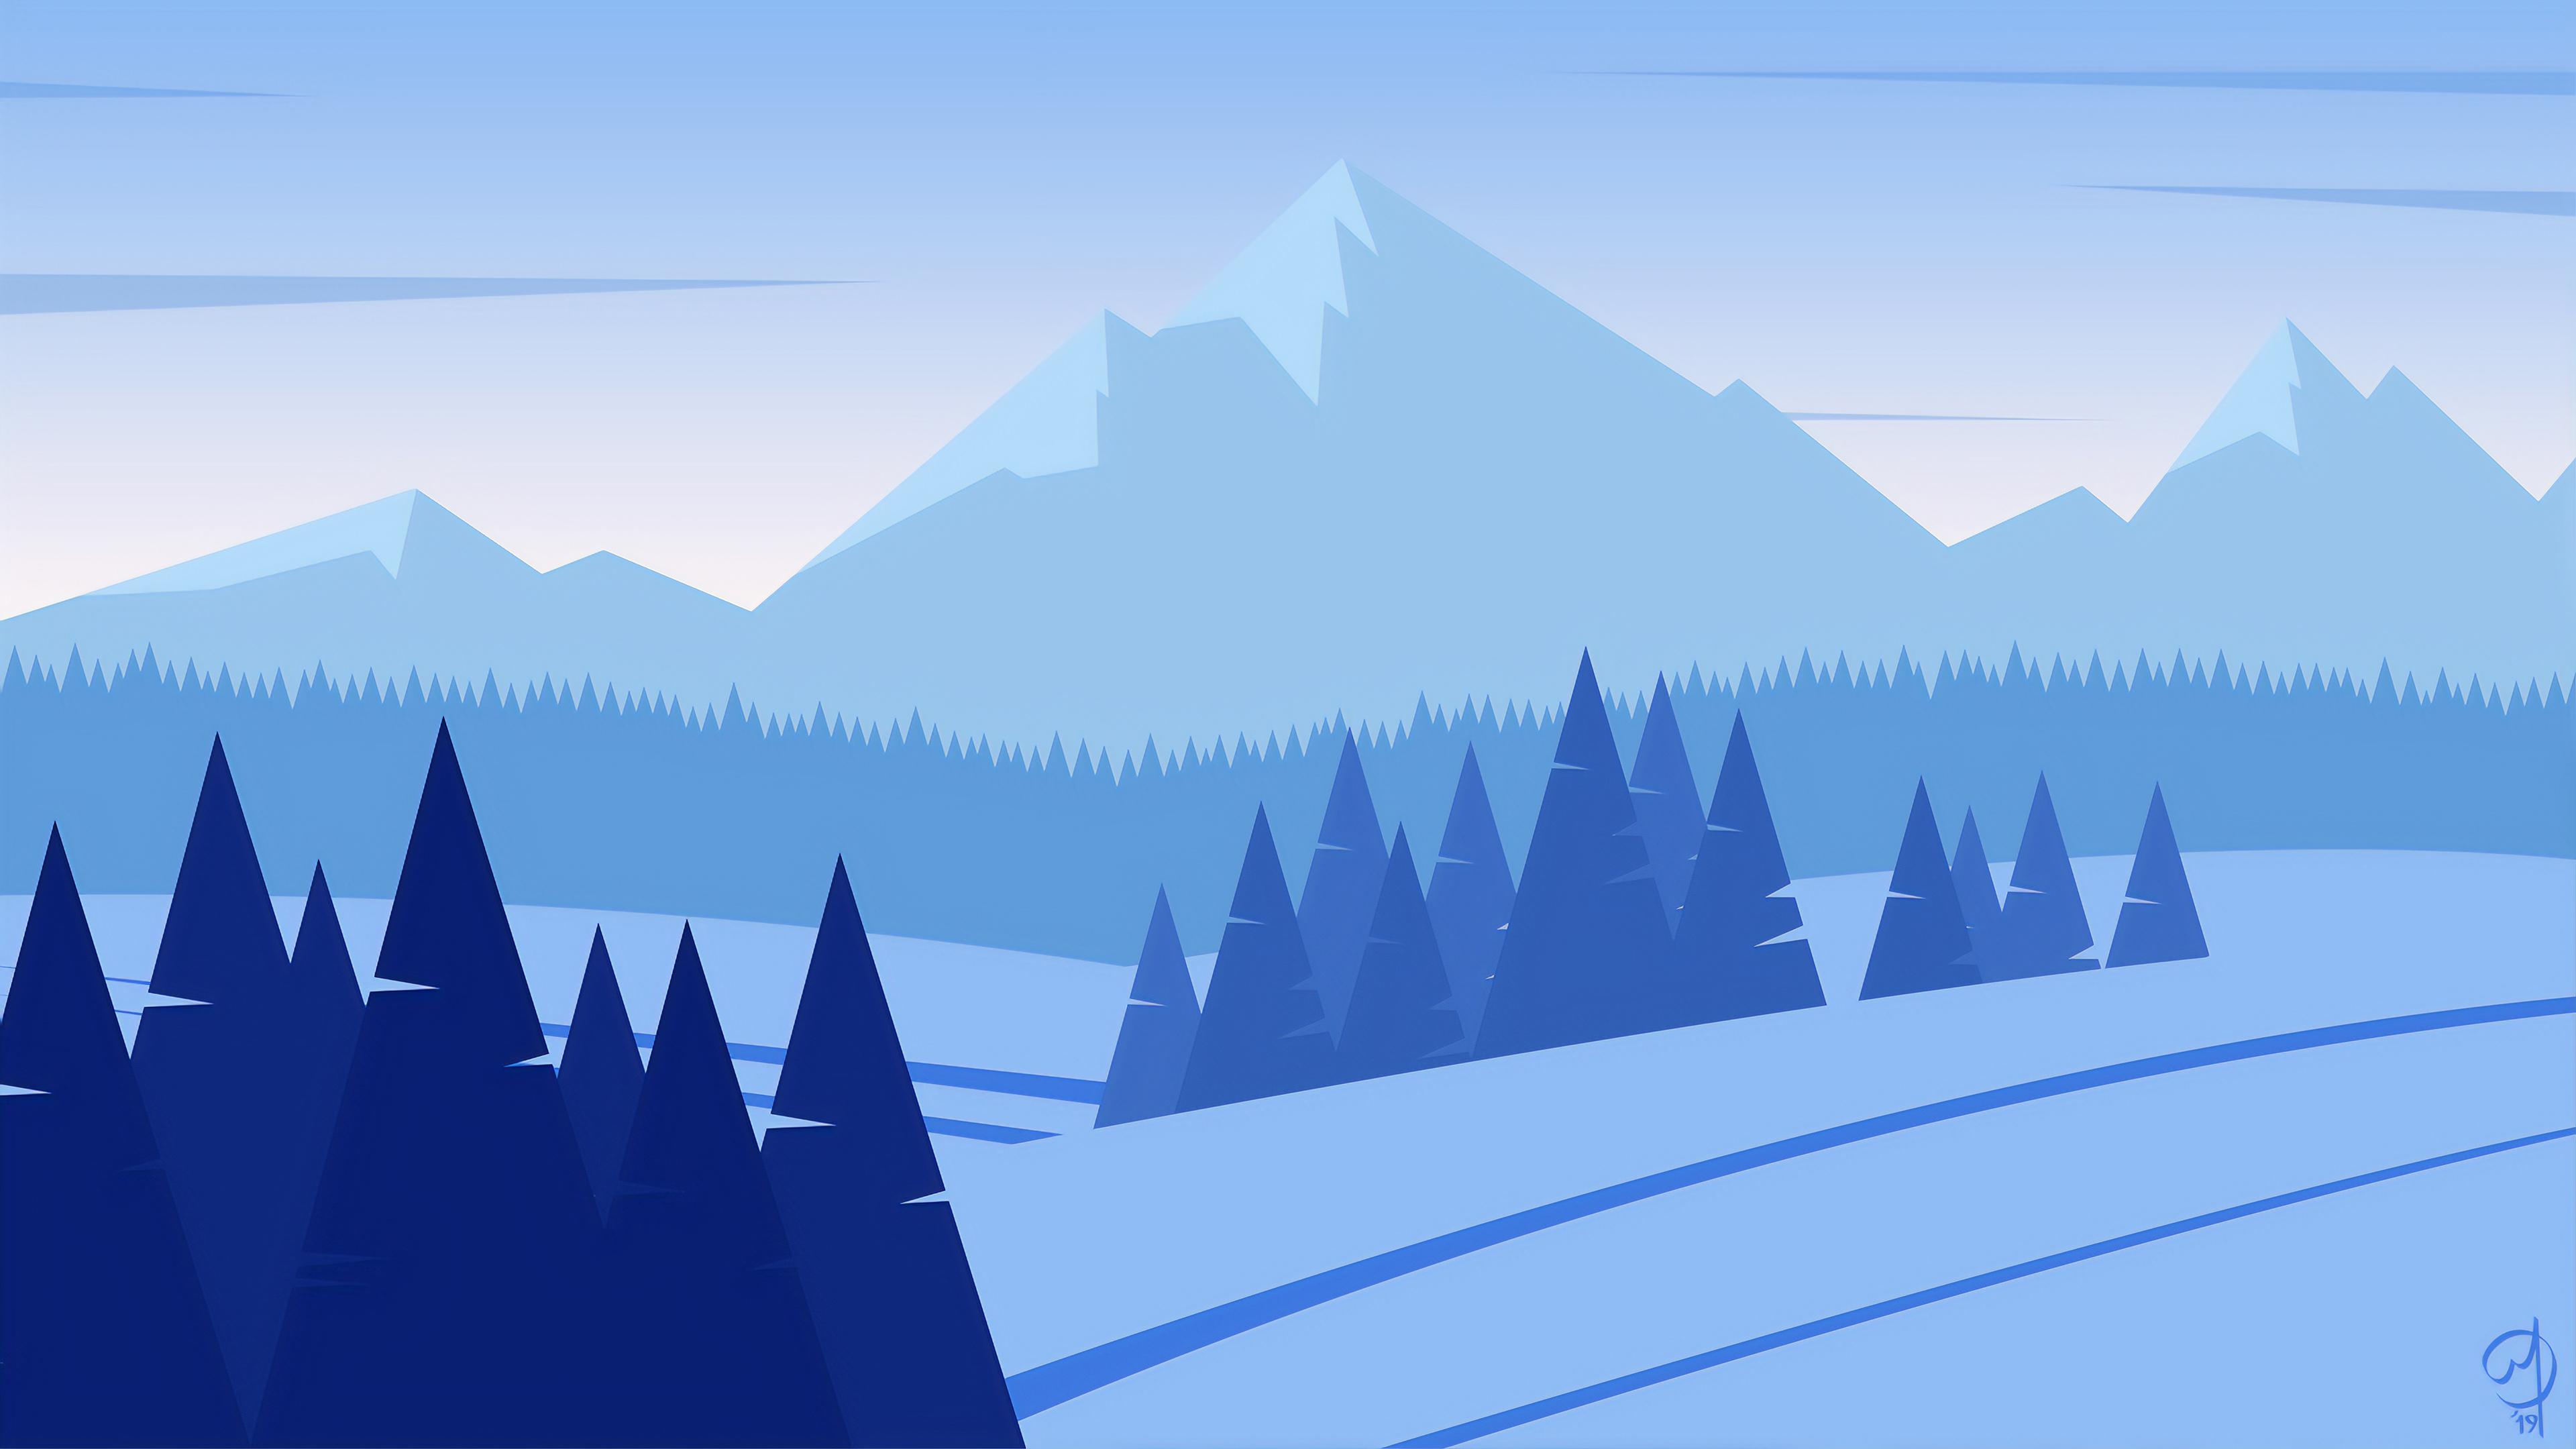 minimalist mountains snow 1574939640 - Minimalist Mountains Snow -